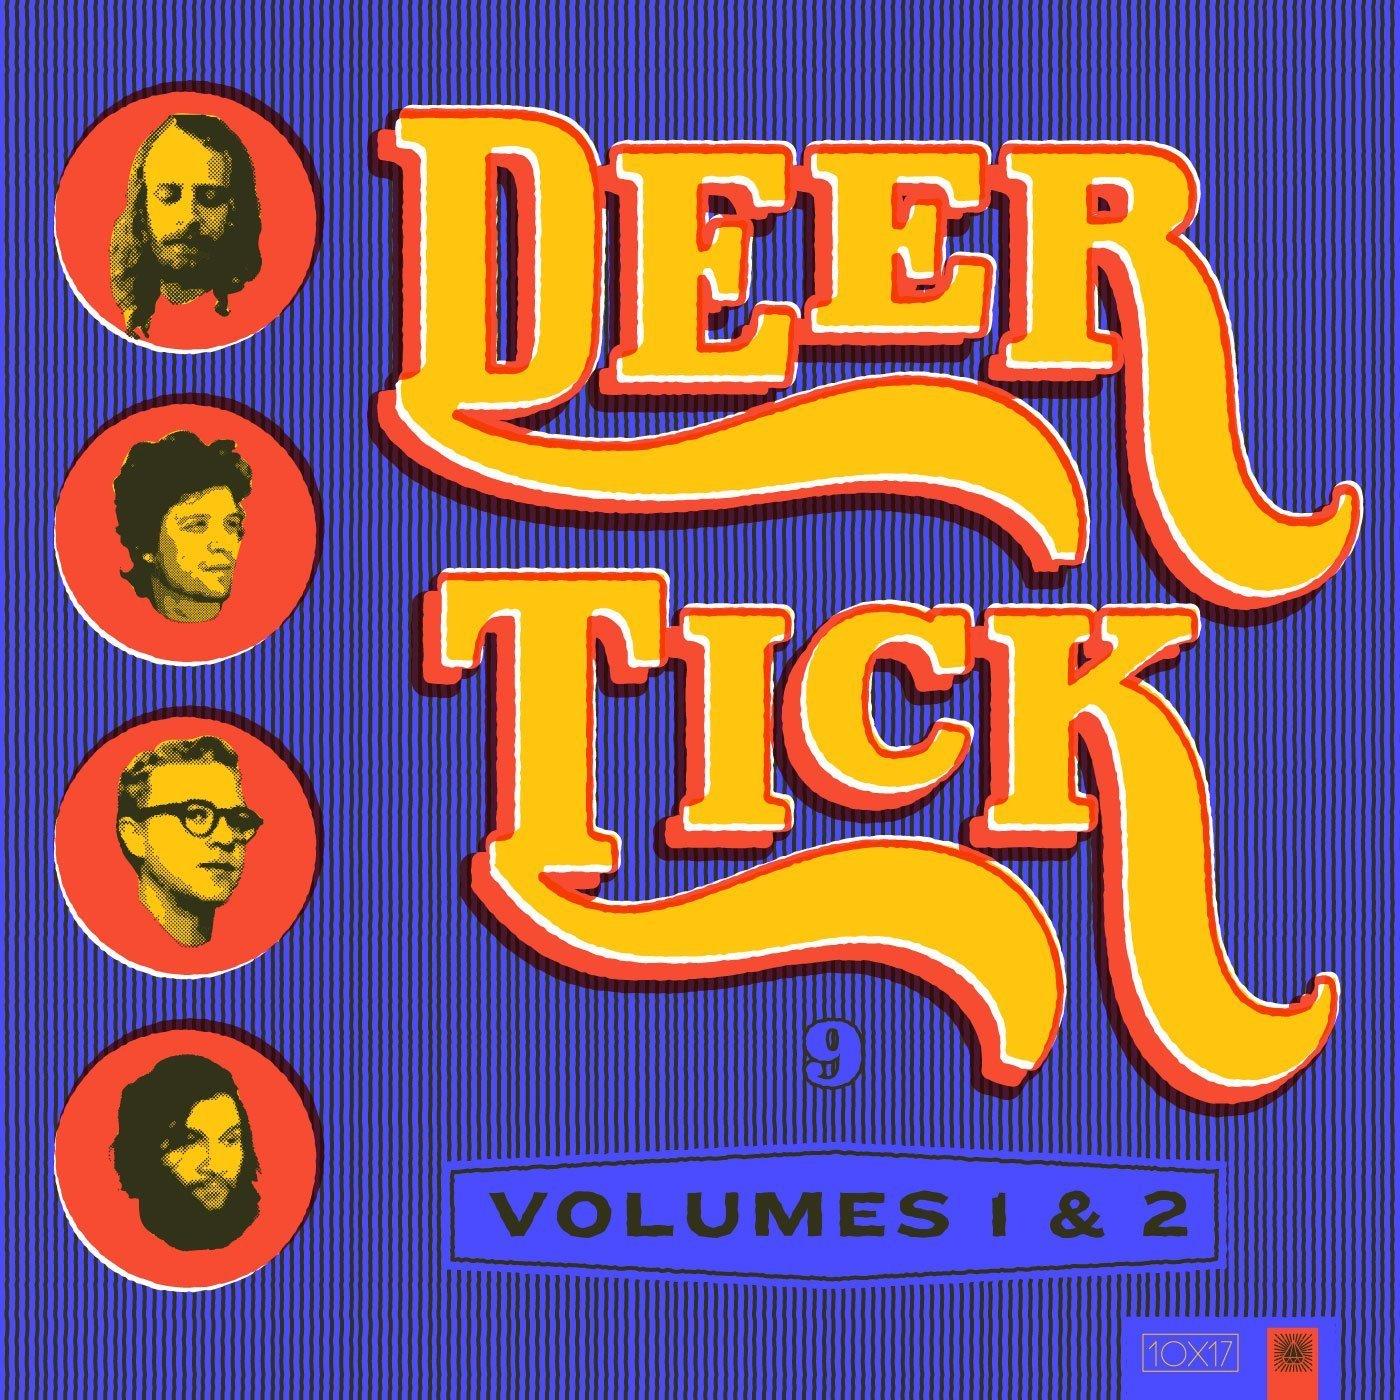 Deer Tick Album Art Reimagined by Amy Hood - Vintage Country Lettering